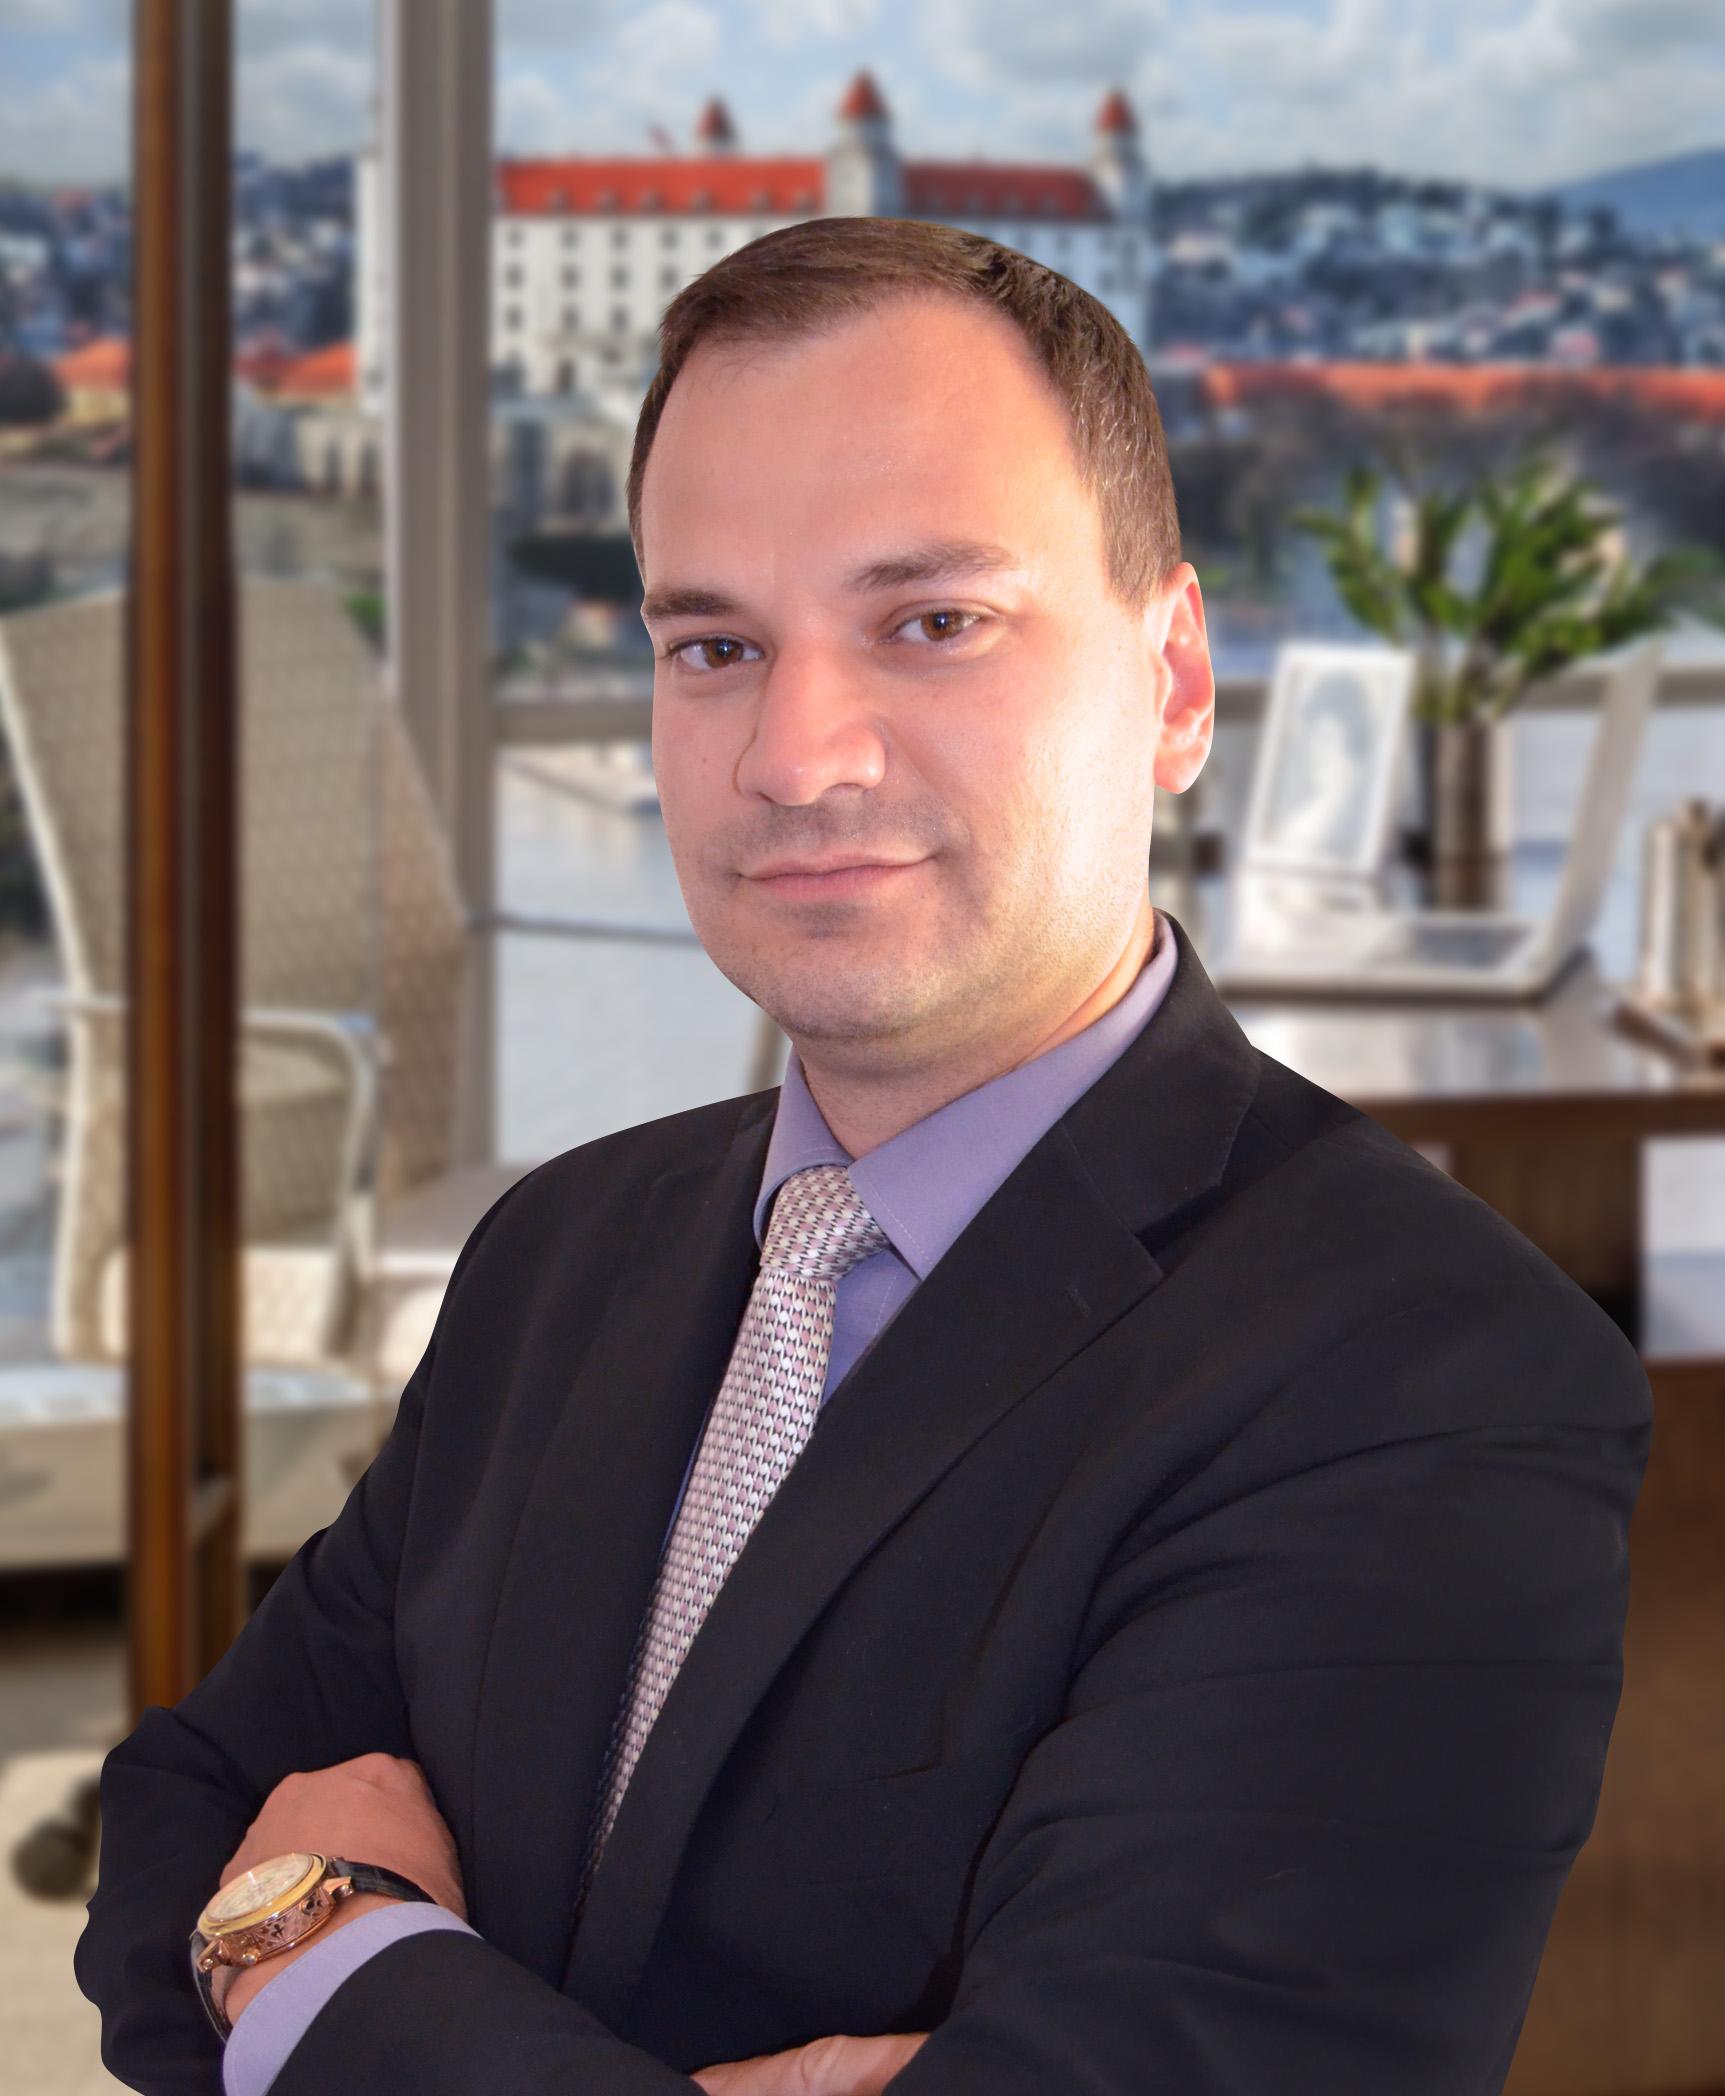 JUDr. Jozef Štefánik